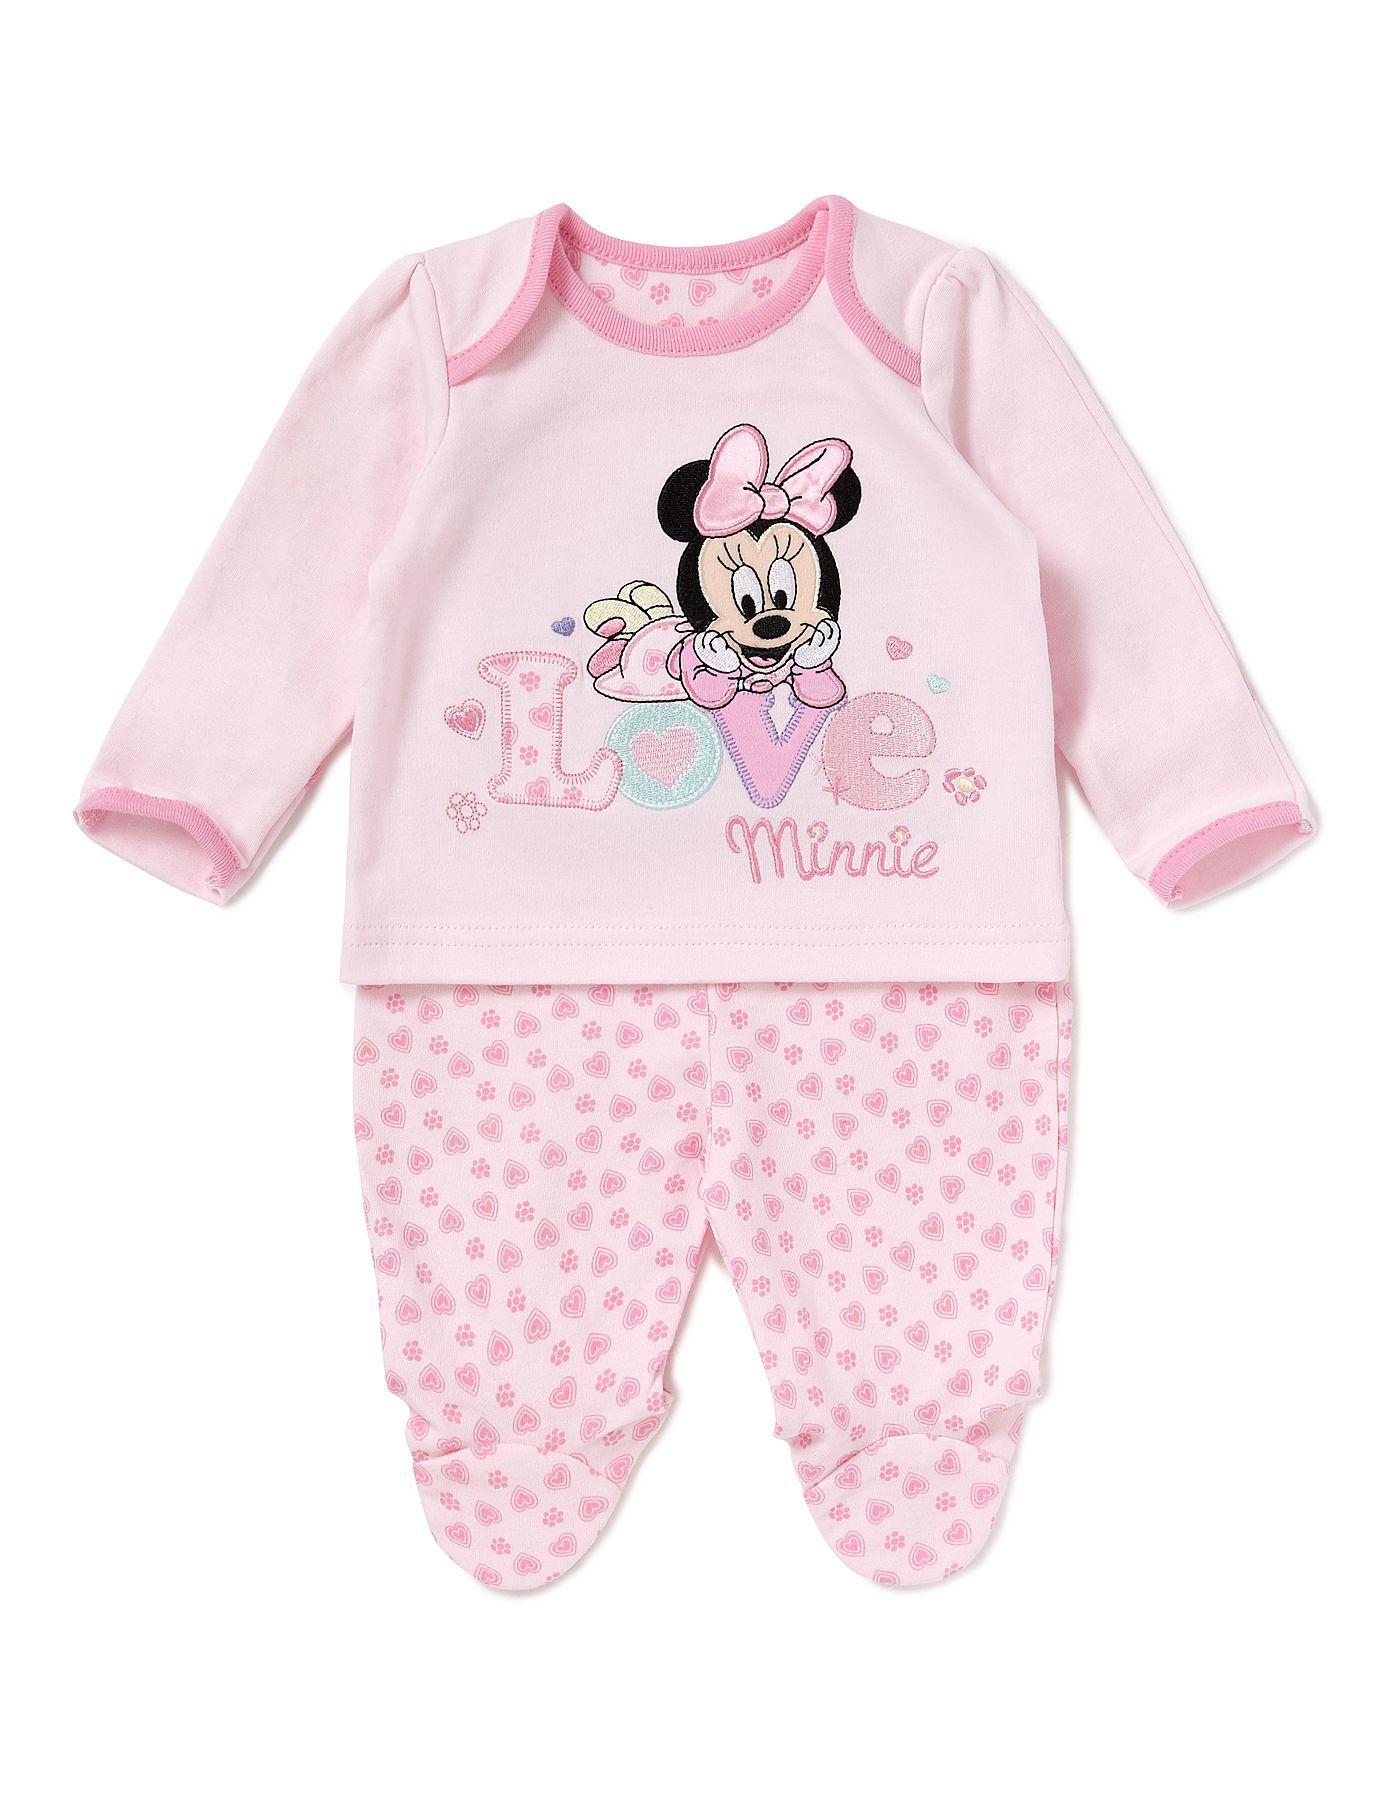 Minnie Mouse Baby Pyjama Set Baby George at ASDA